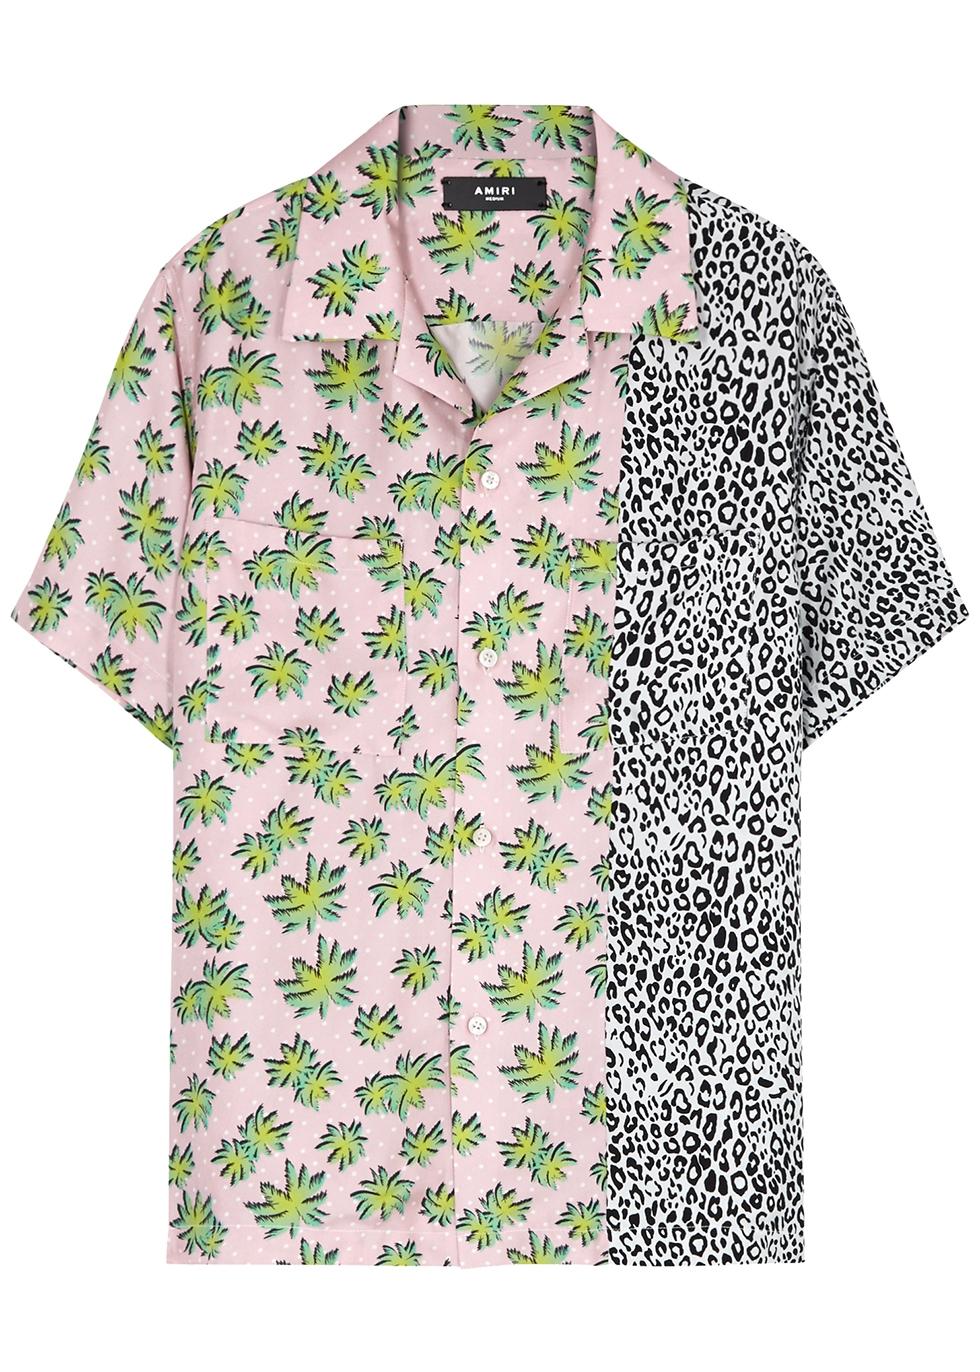 Purple Collarless Shirts Grandad Shirt sizes small to 2XL